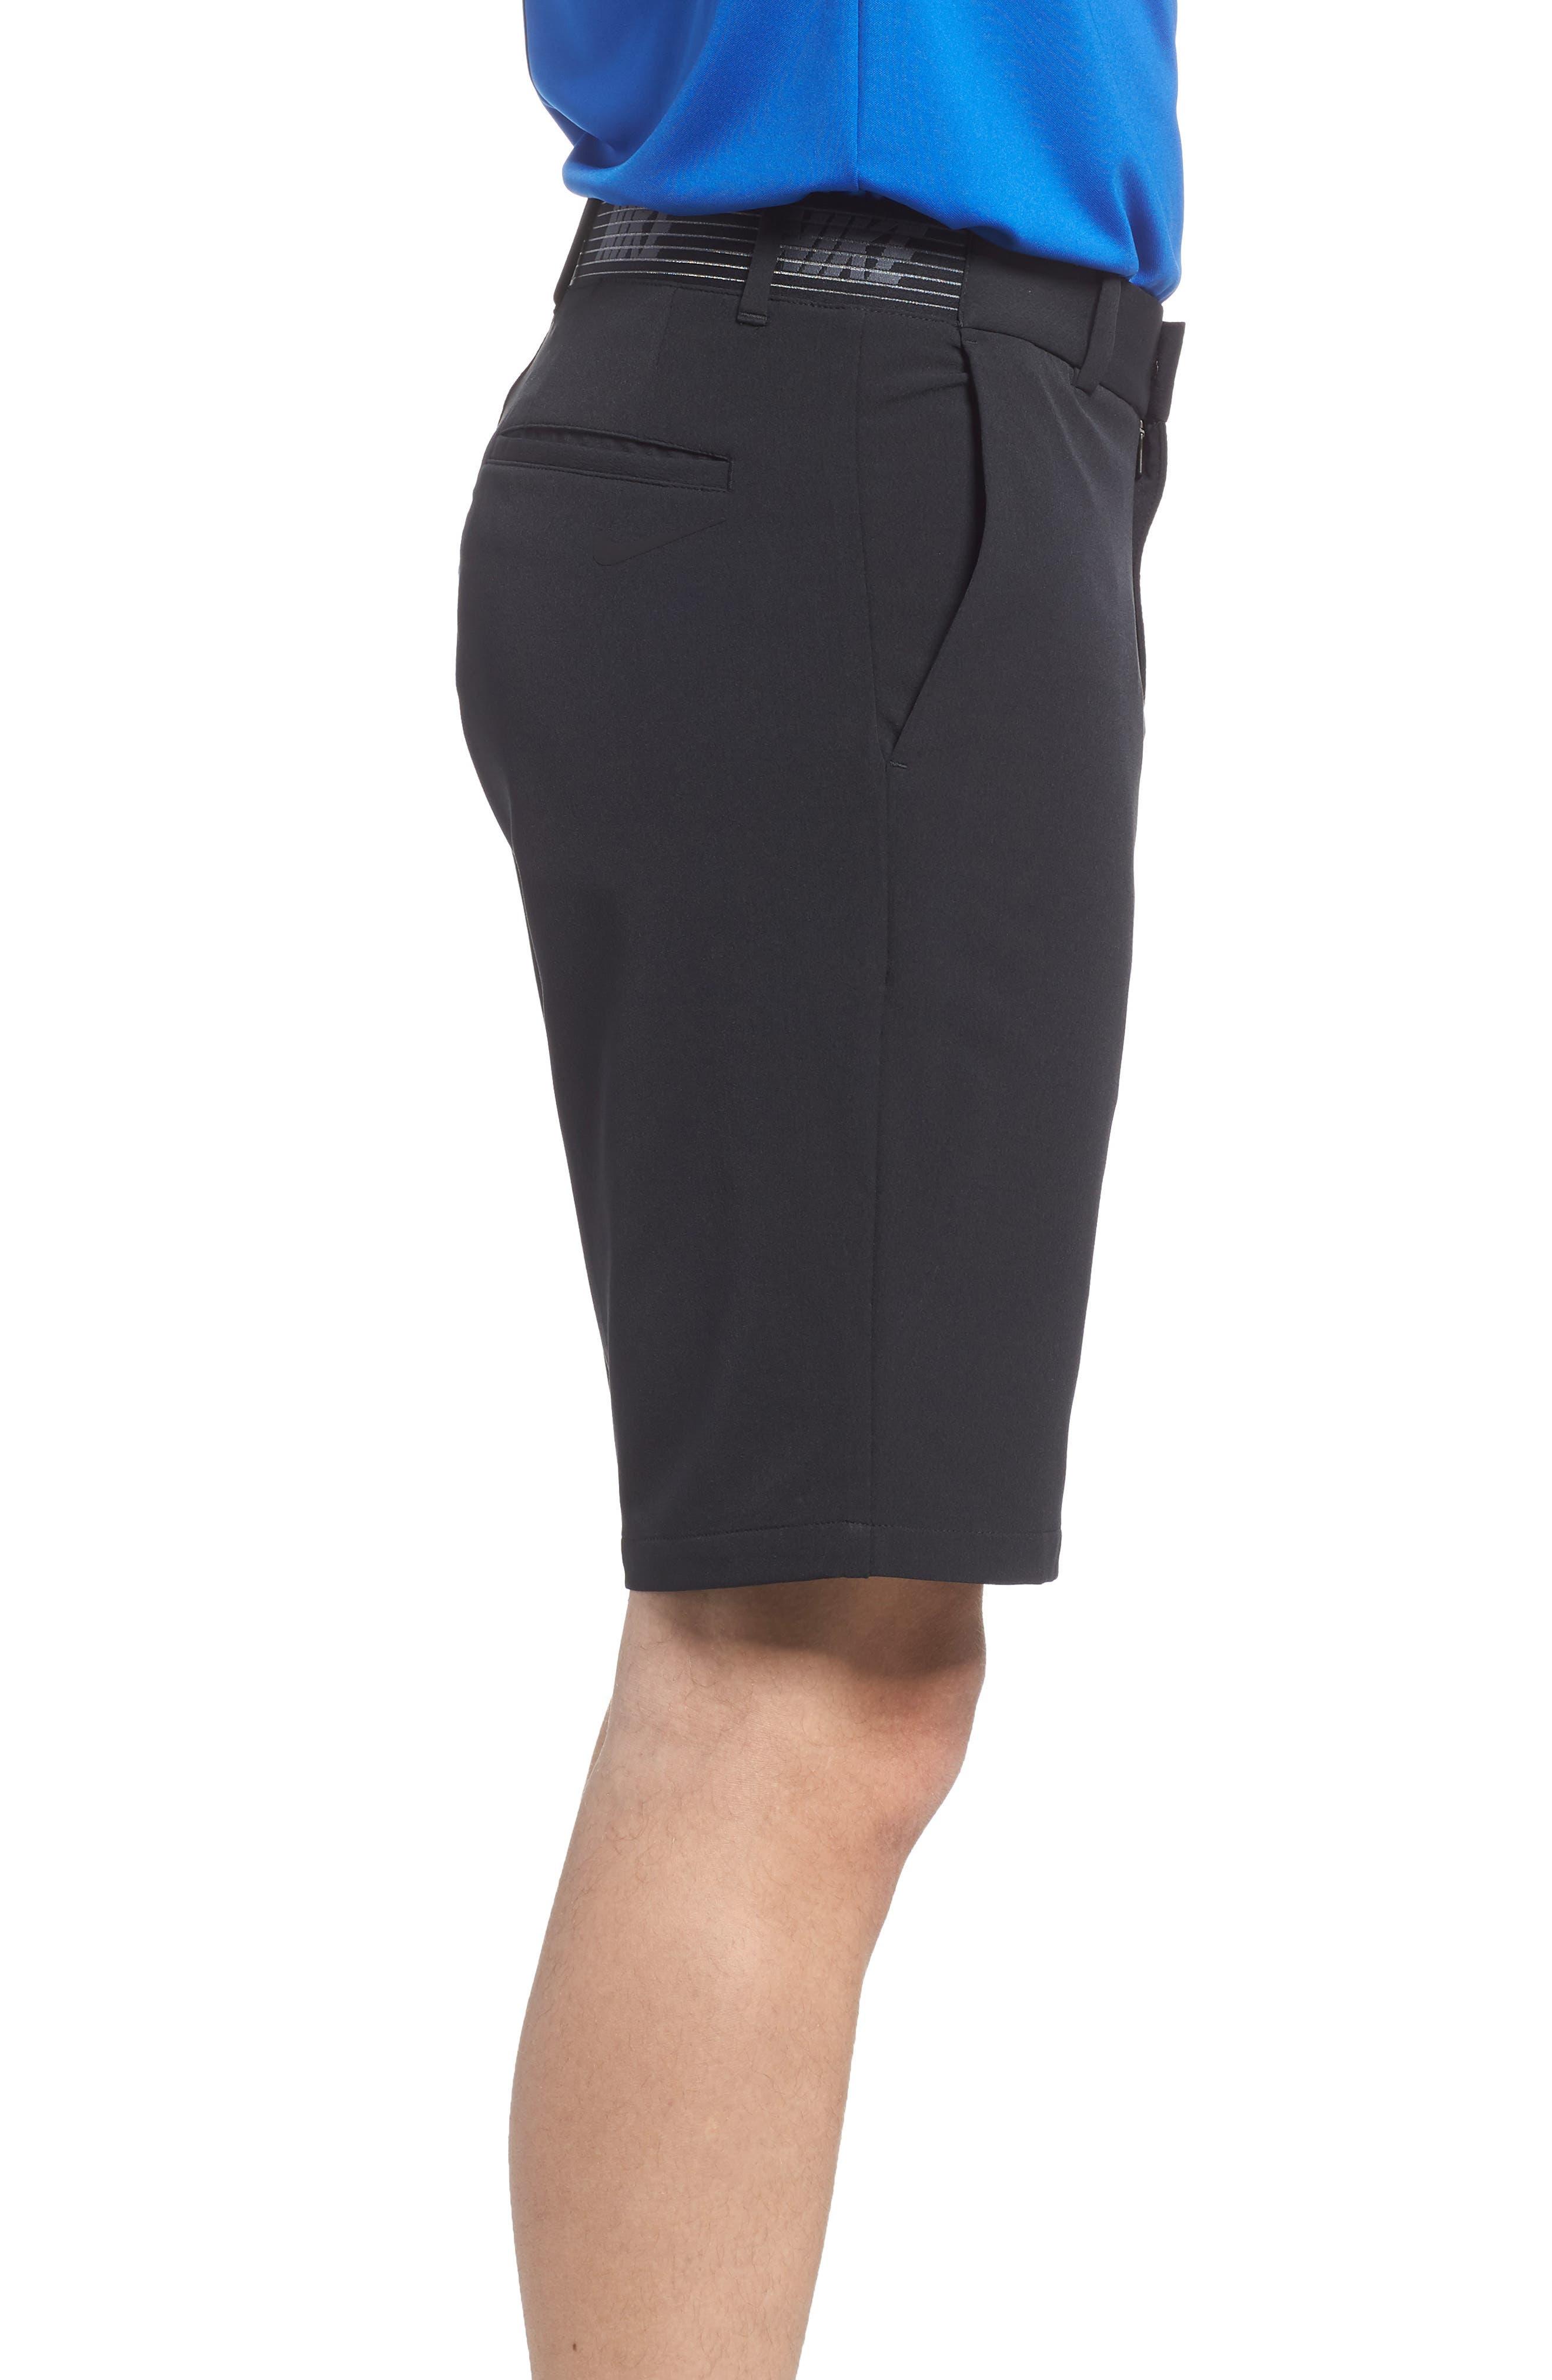 Dry Flex Slim Fit Golf Shorts,                             Alternate thumbnail 3, color,                             Black/ Black